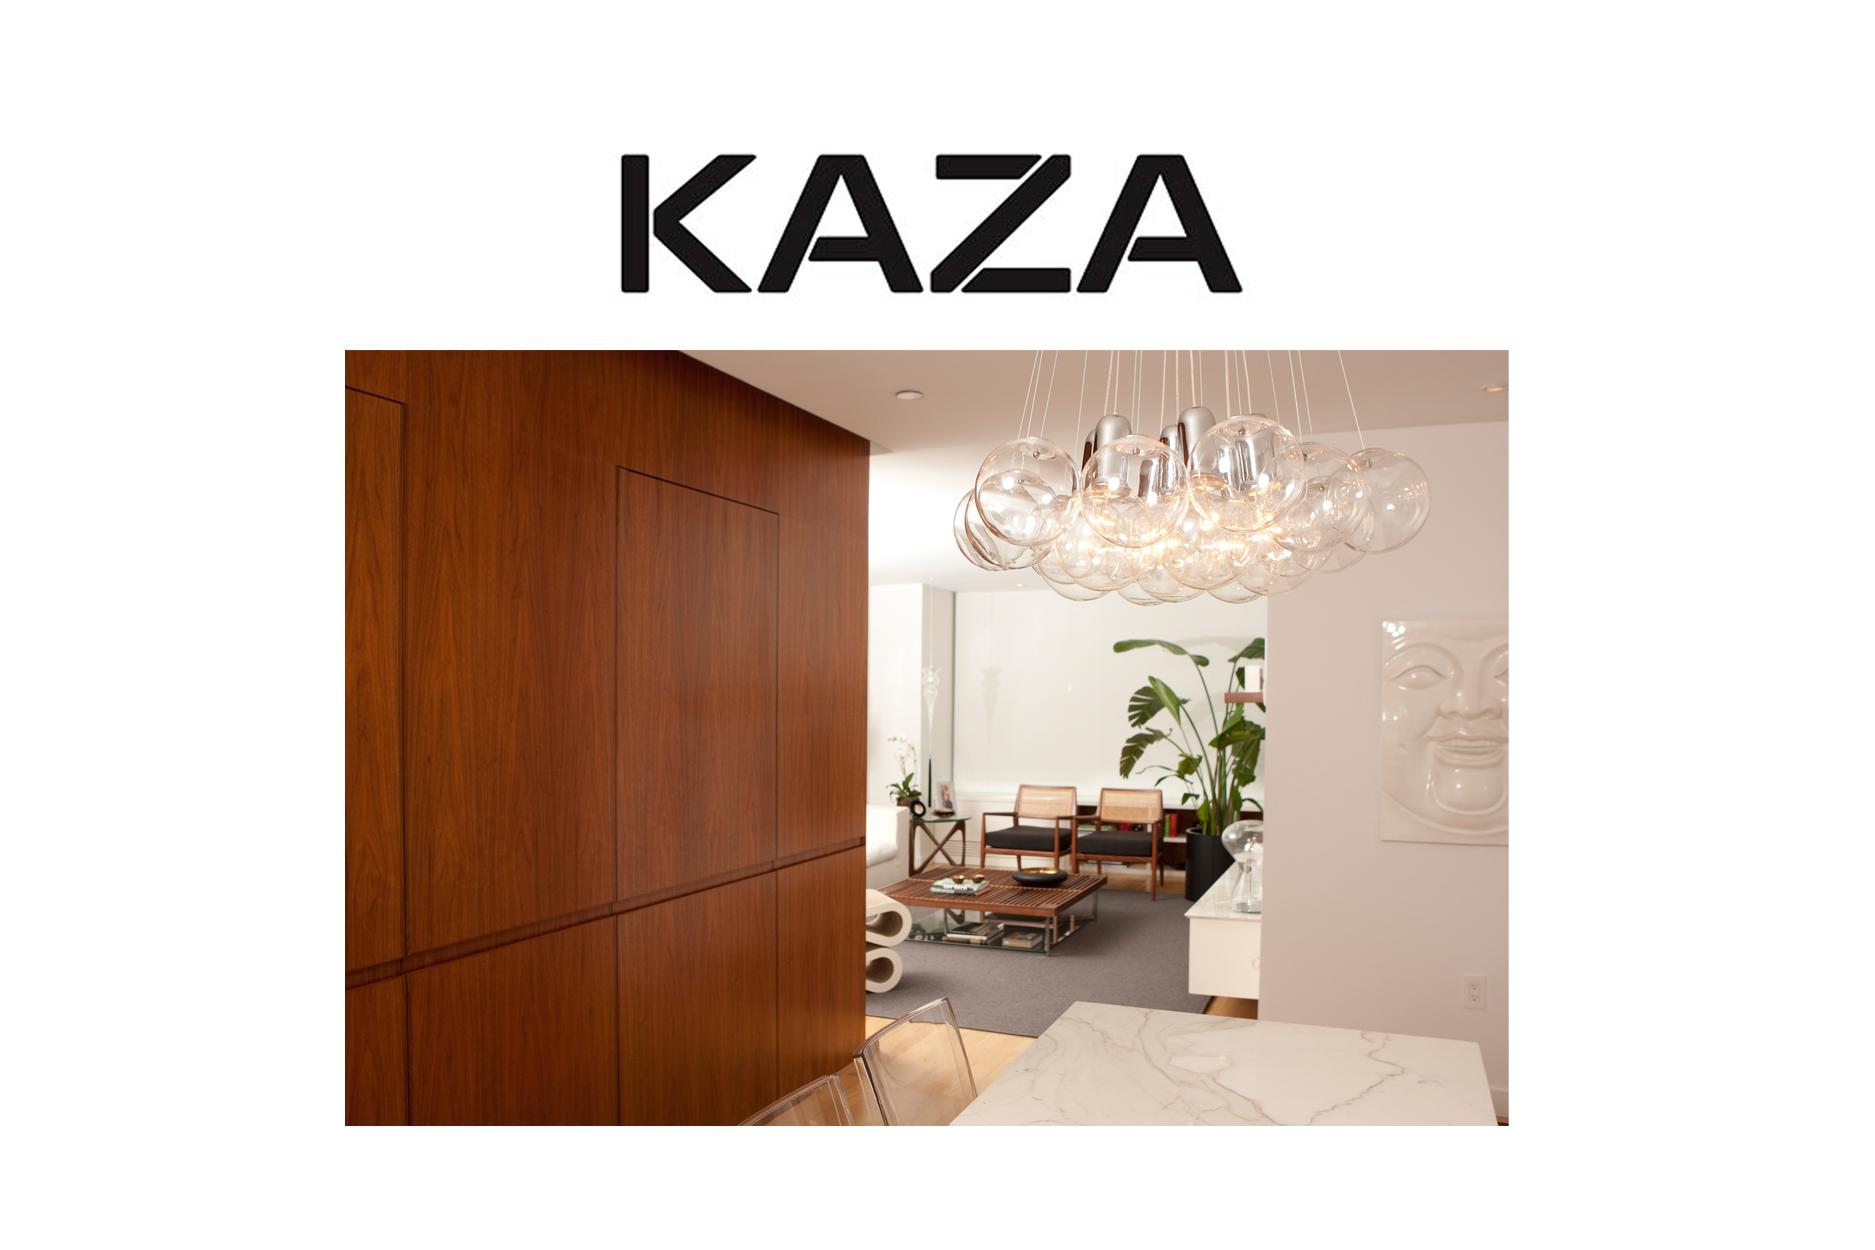 Kaza Magazine | William Street